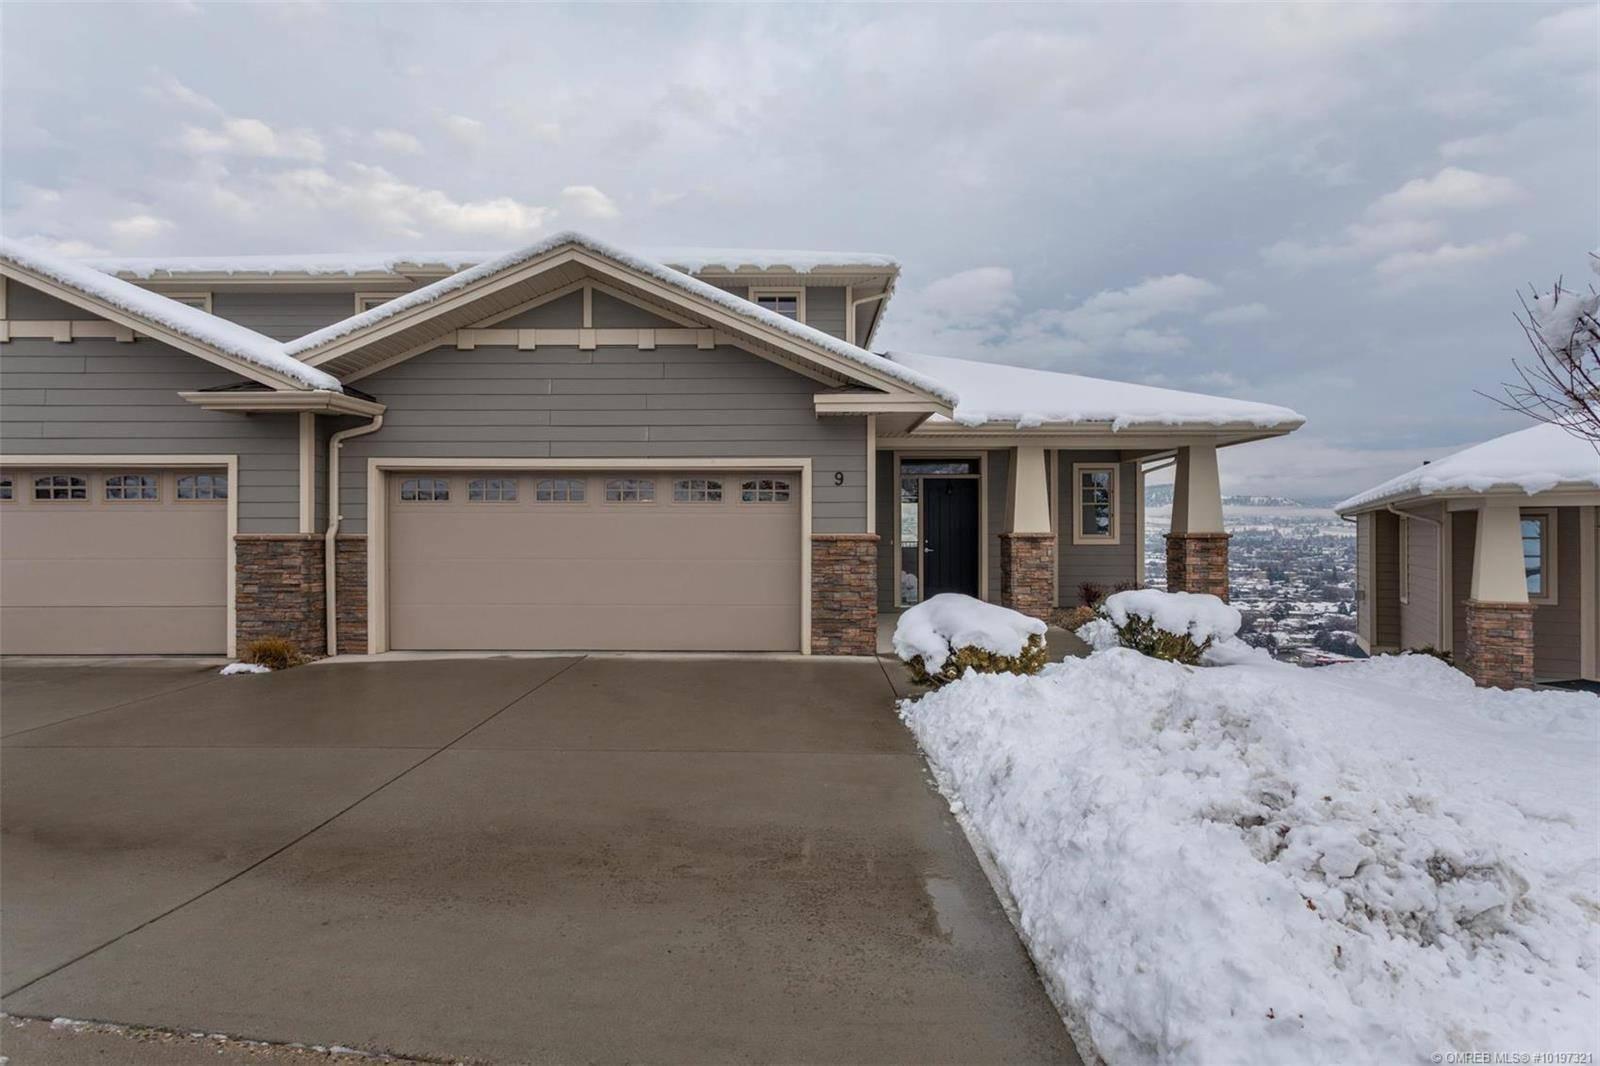 Townhouse for sale at 971 Monashee Pl Unit 9 Kelowna British Columbia - MLS: 10197321